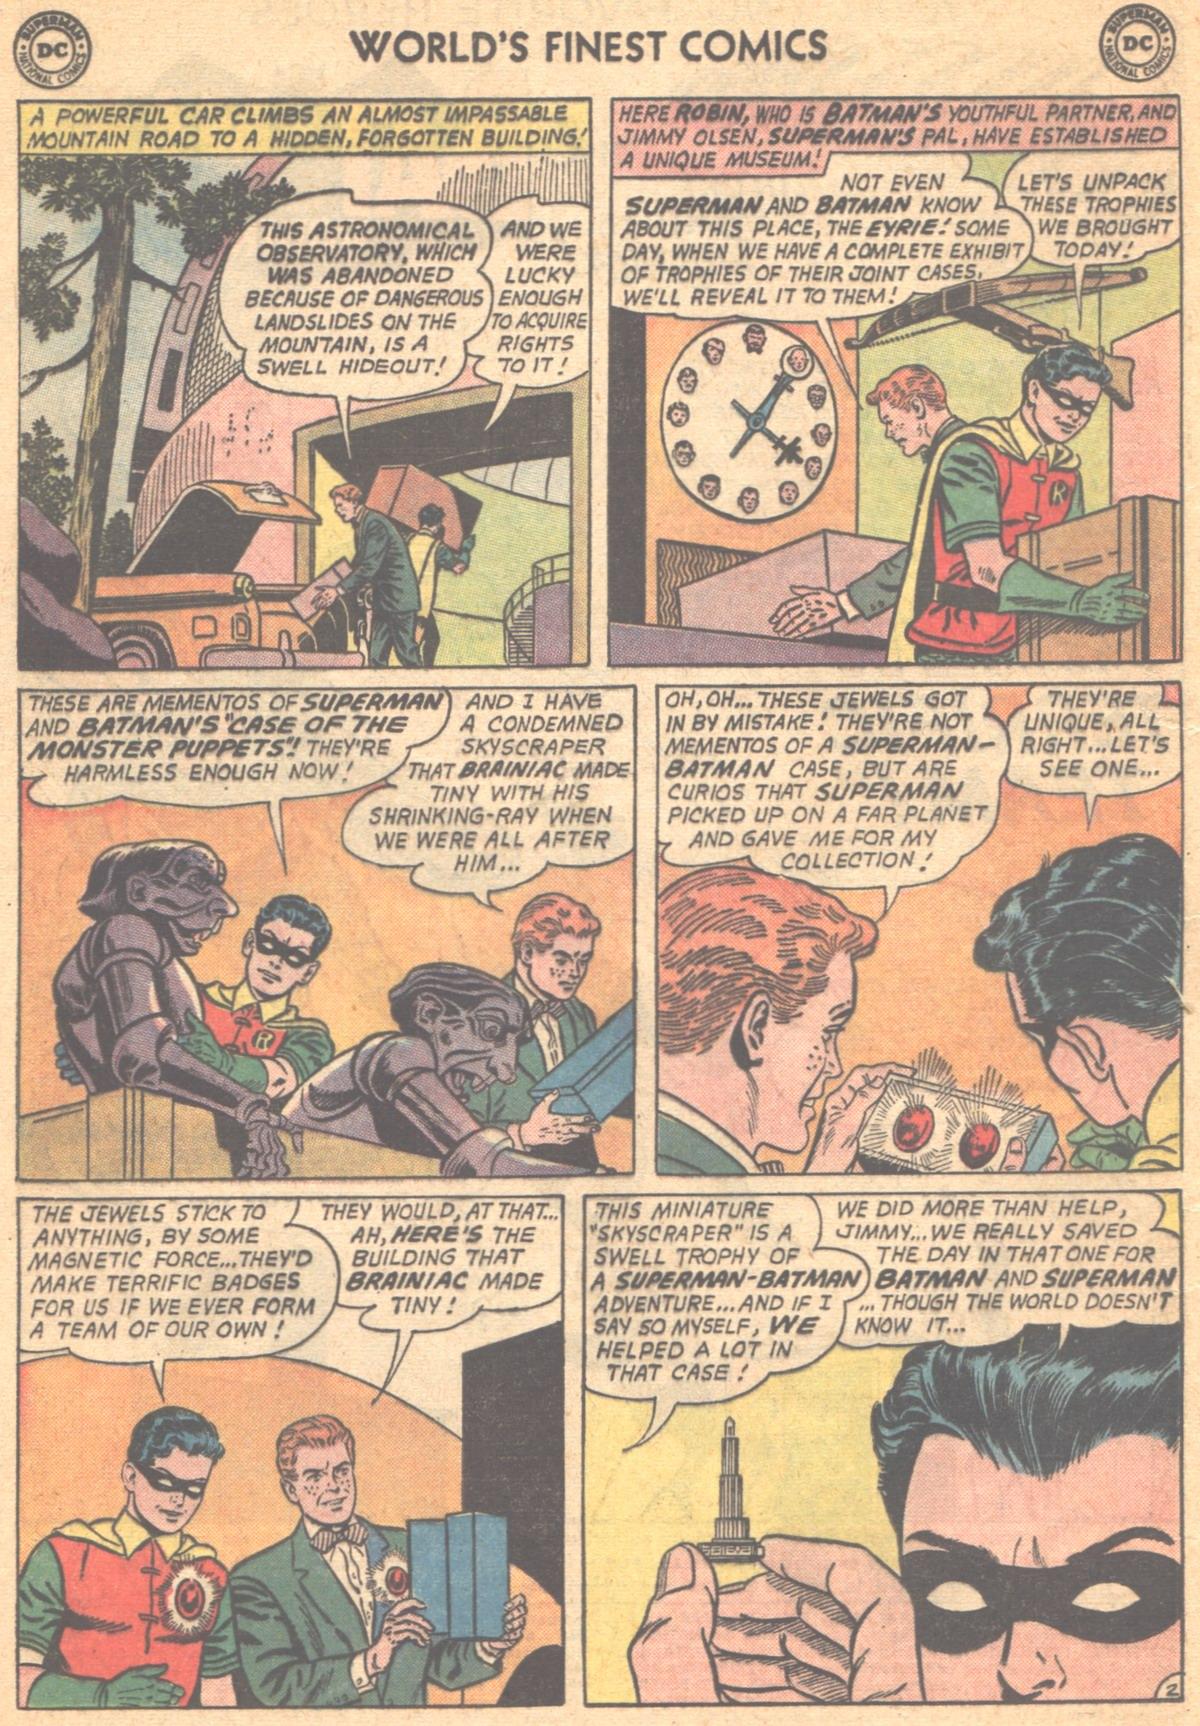 Read online World's Finest Comics comic -  Issue #147 - 4